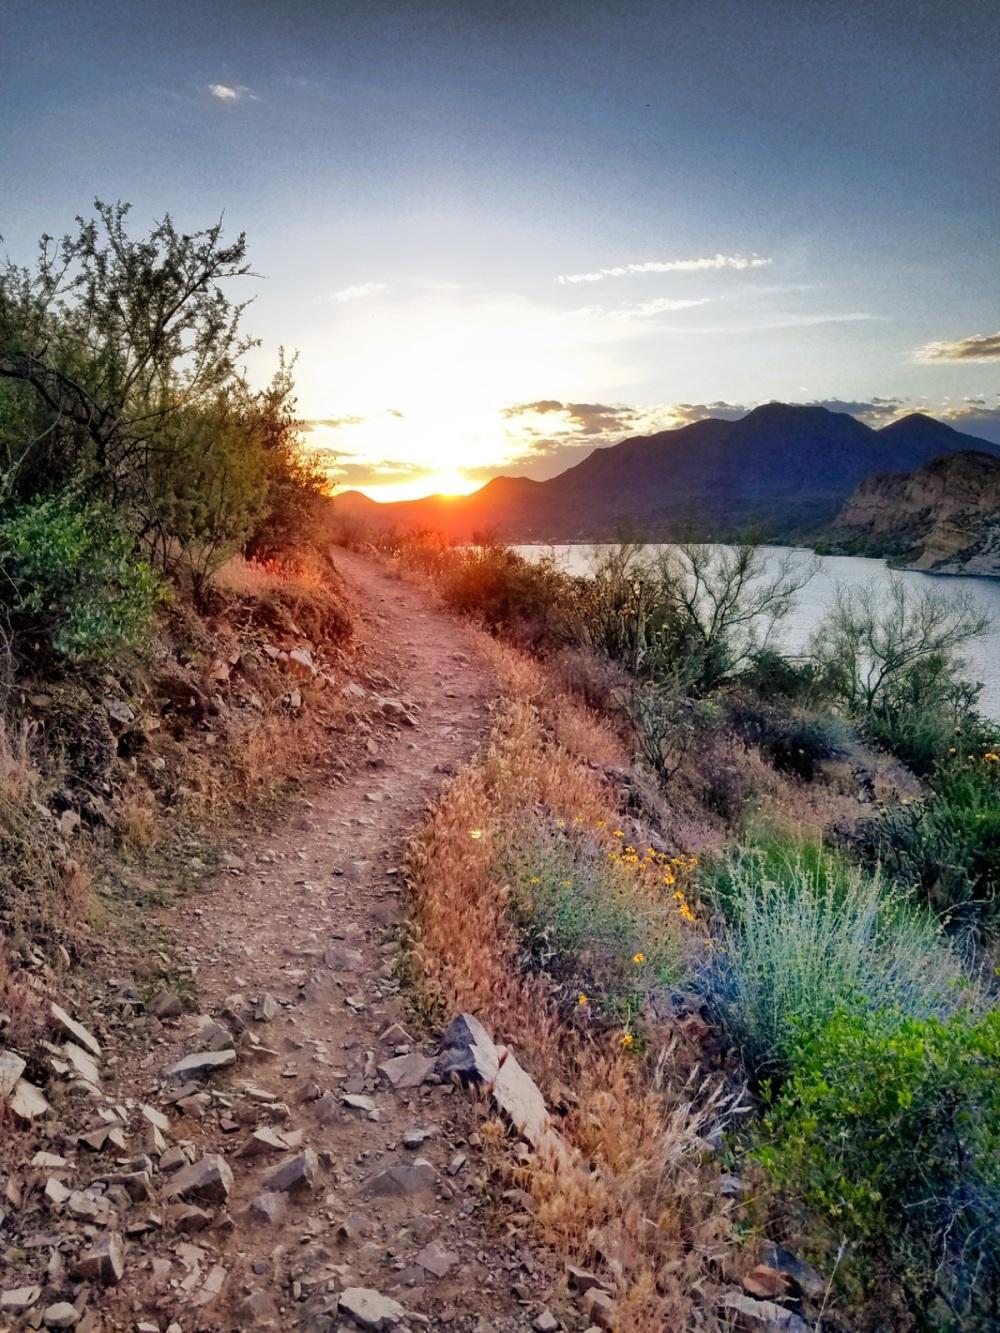 Hiking Butcher Jones Trail - Sunset view from Butcher Jones Trail,  Saguaro Lake, Arizona